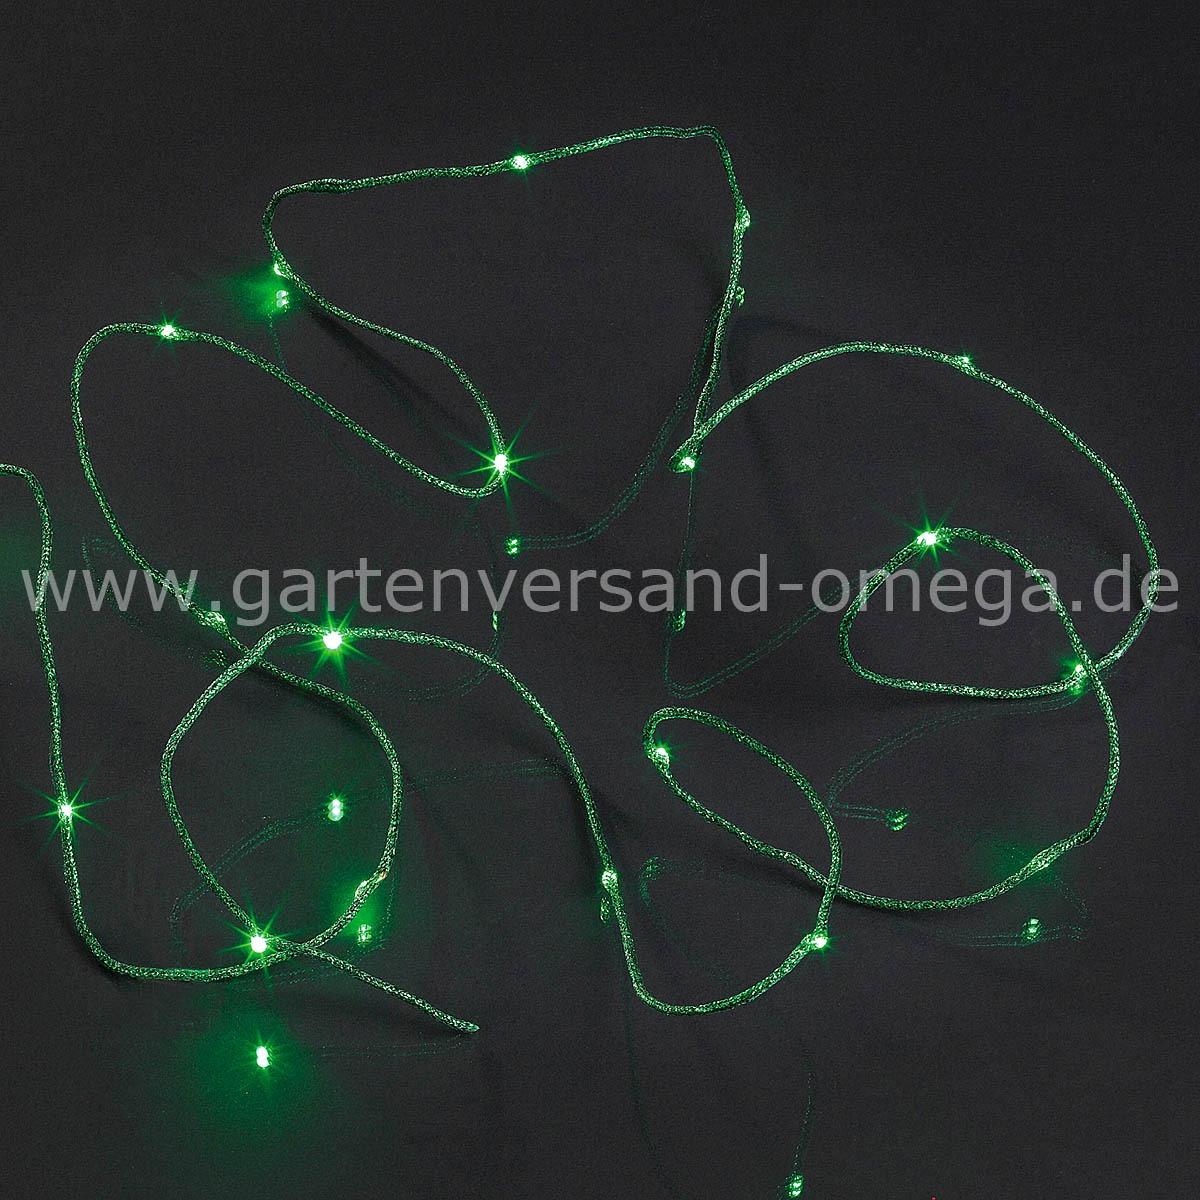 Batteriebetriebene LED-Lichterkette mit farbigem Drahtkabel - LED ...